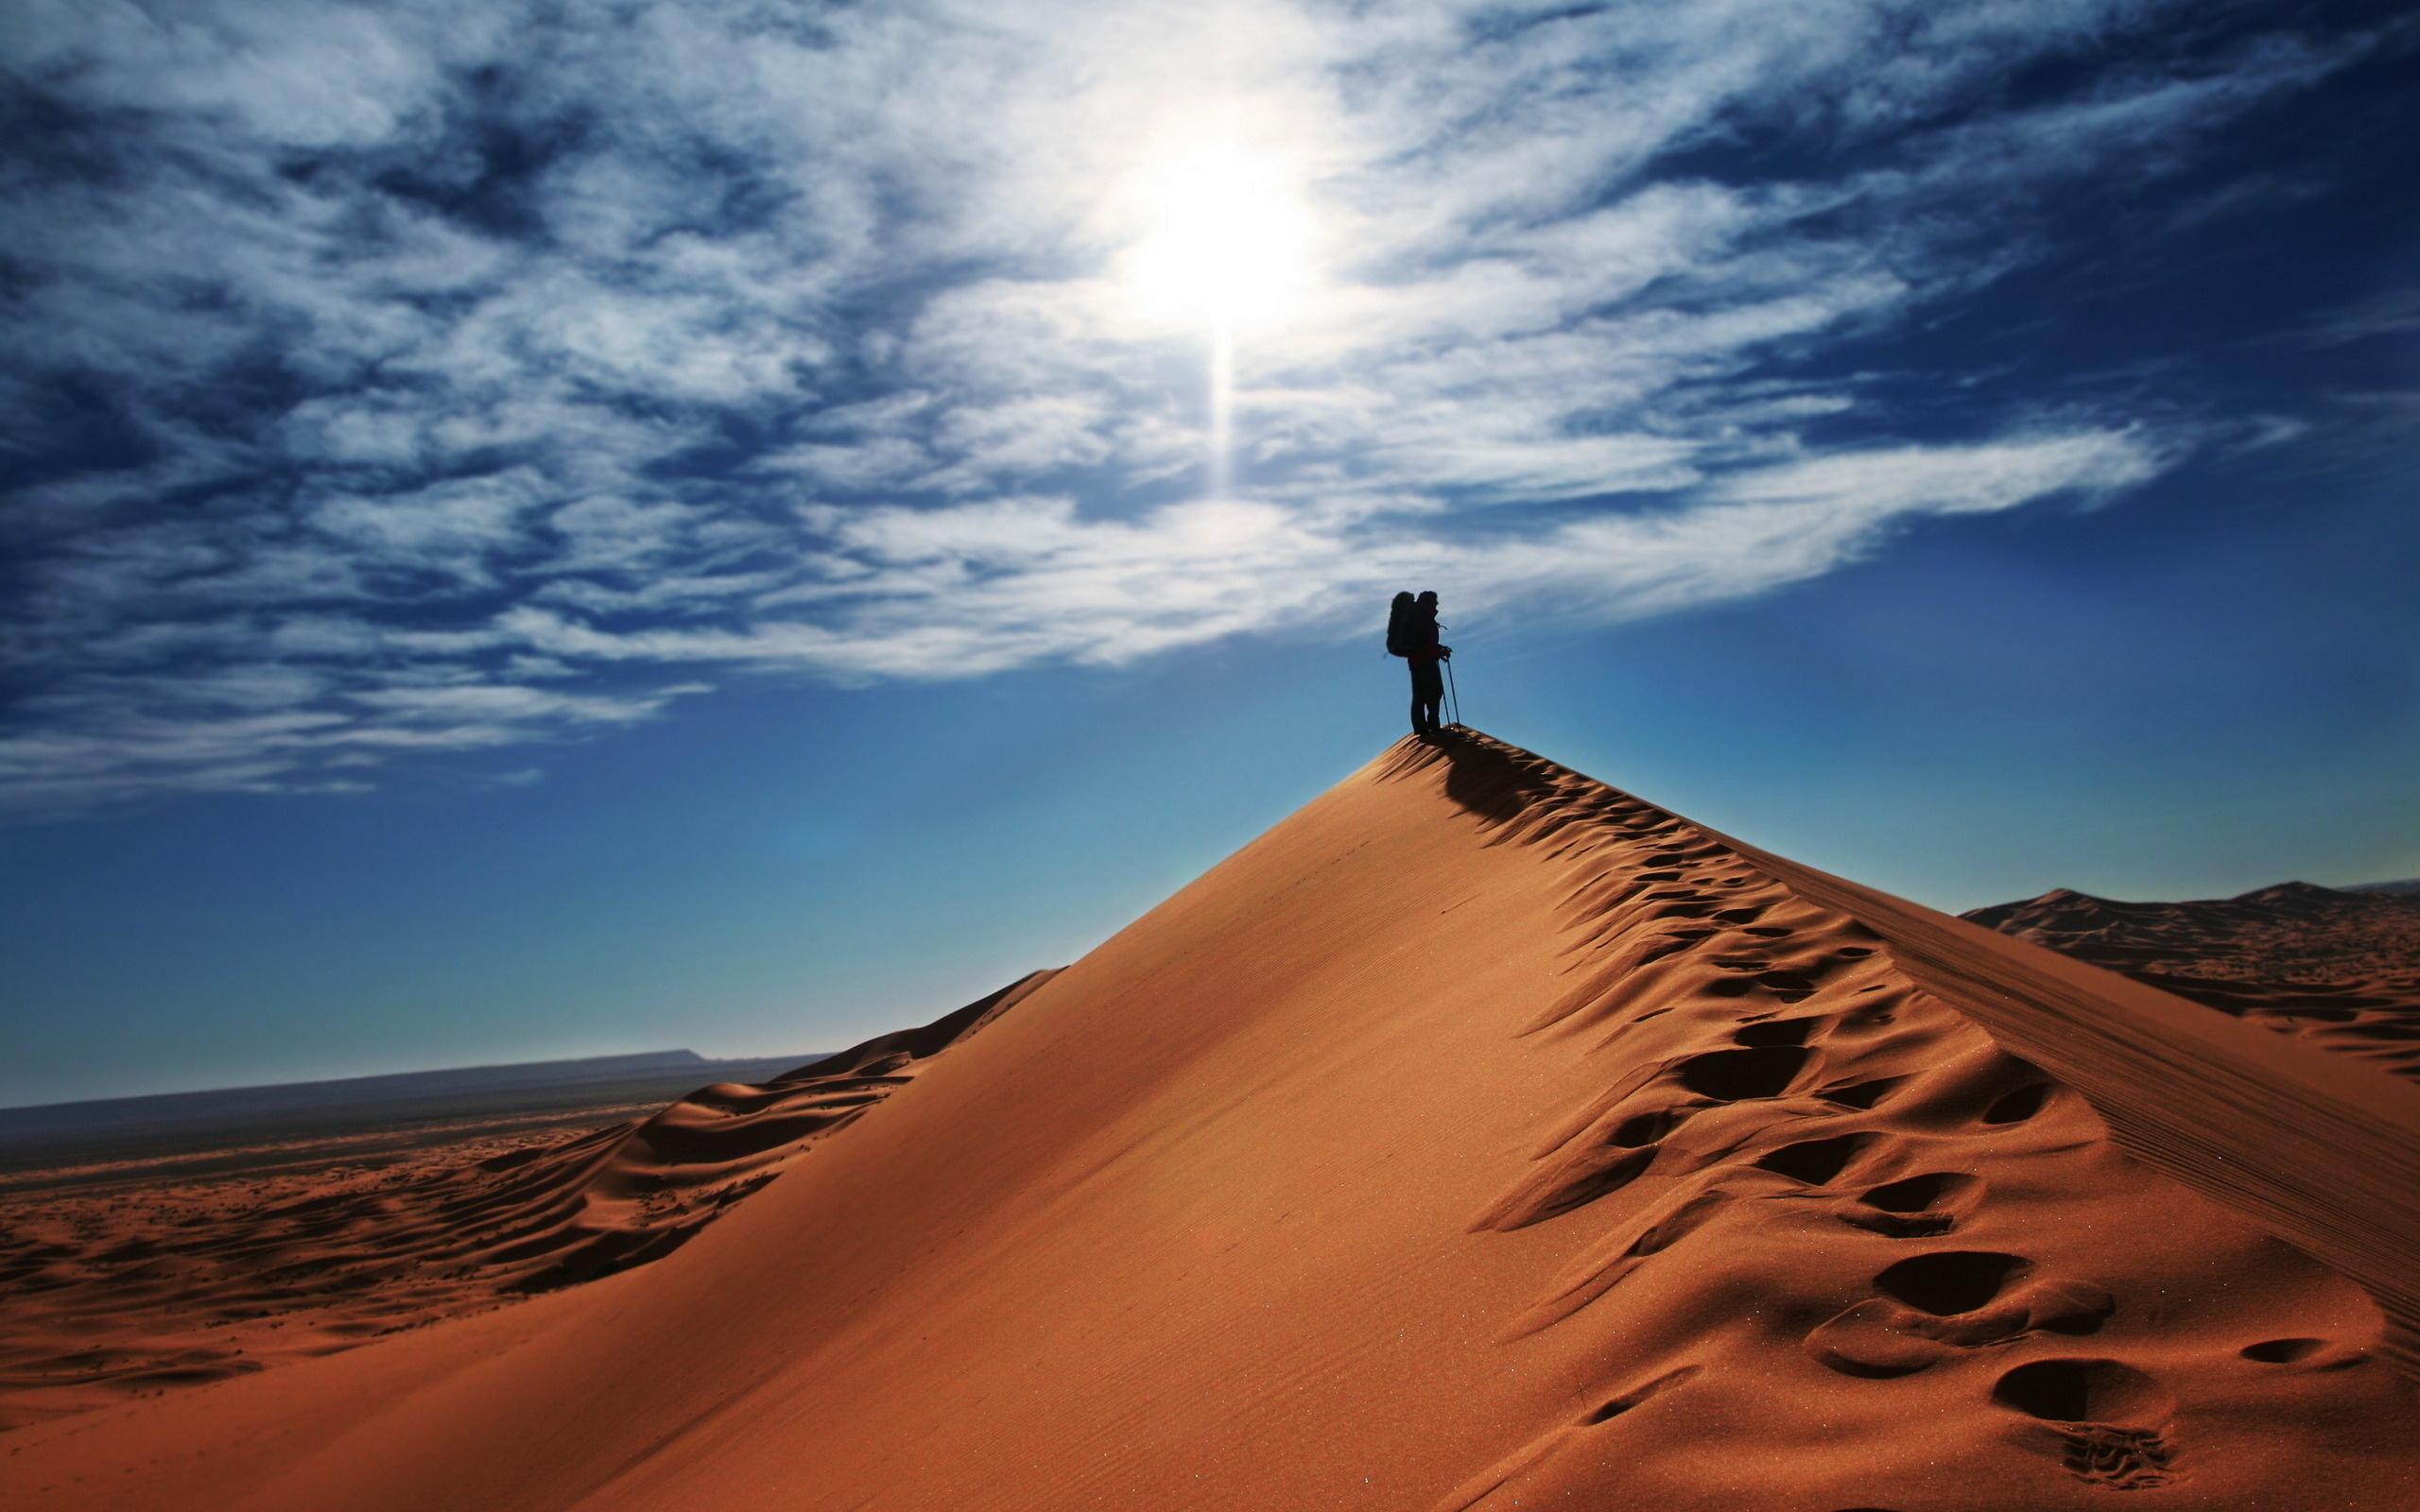 Картинки на аву пустыни